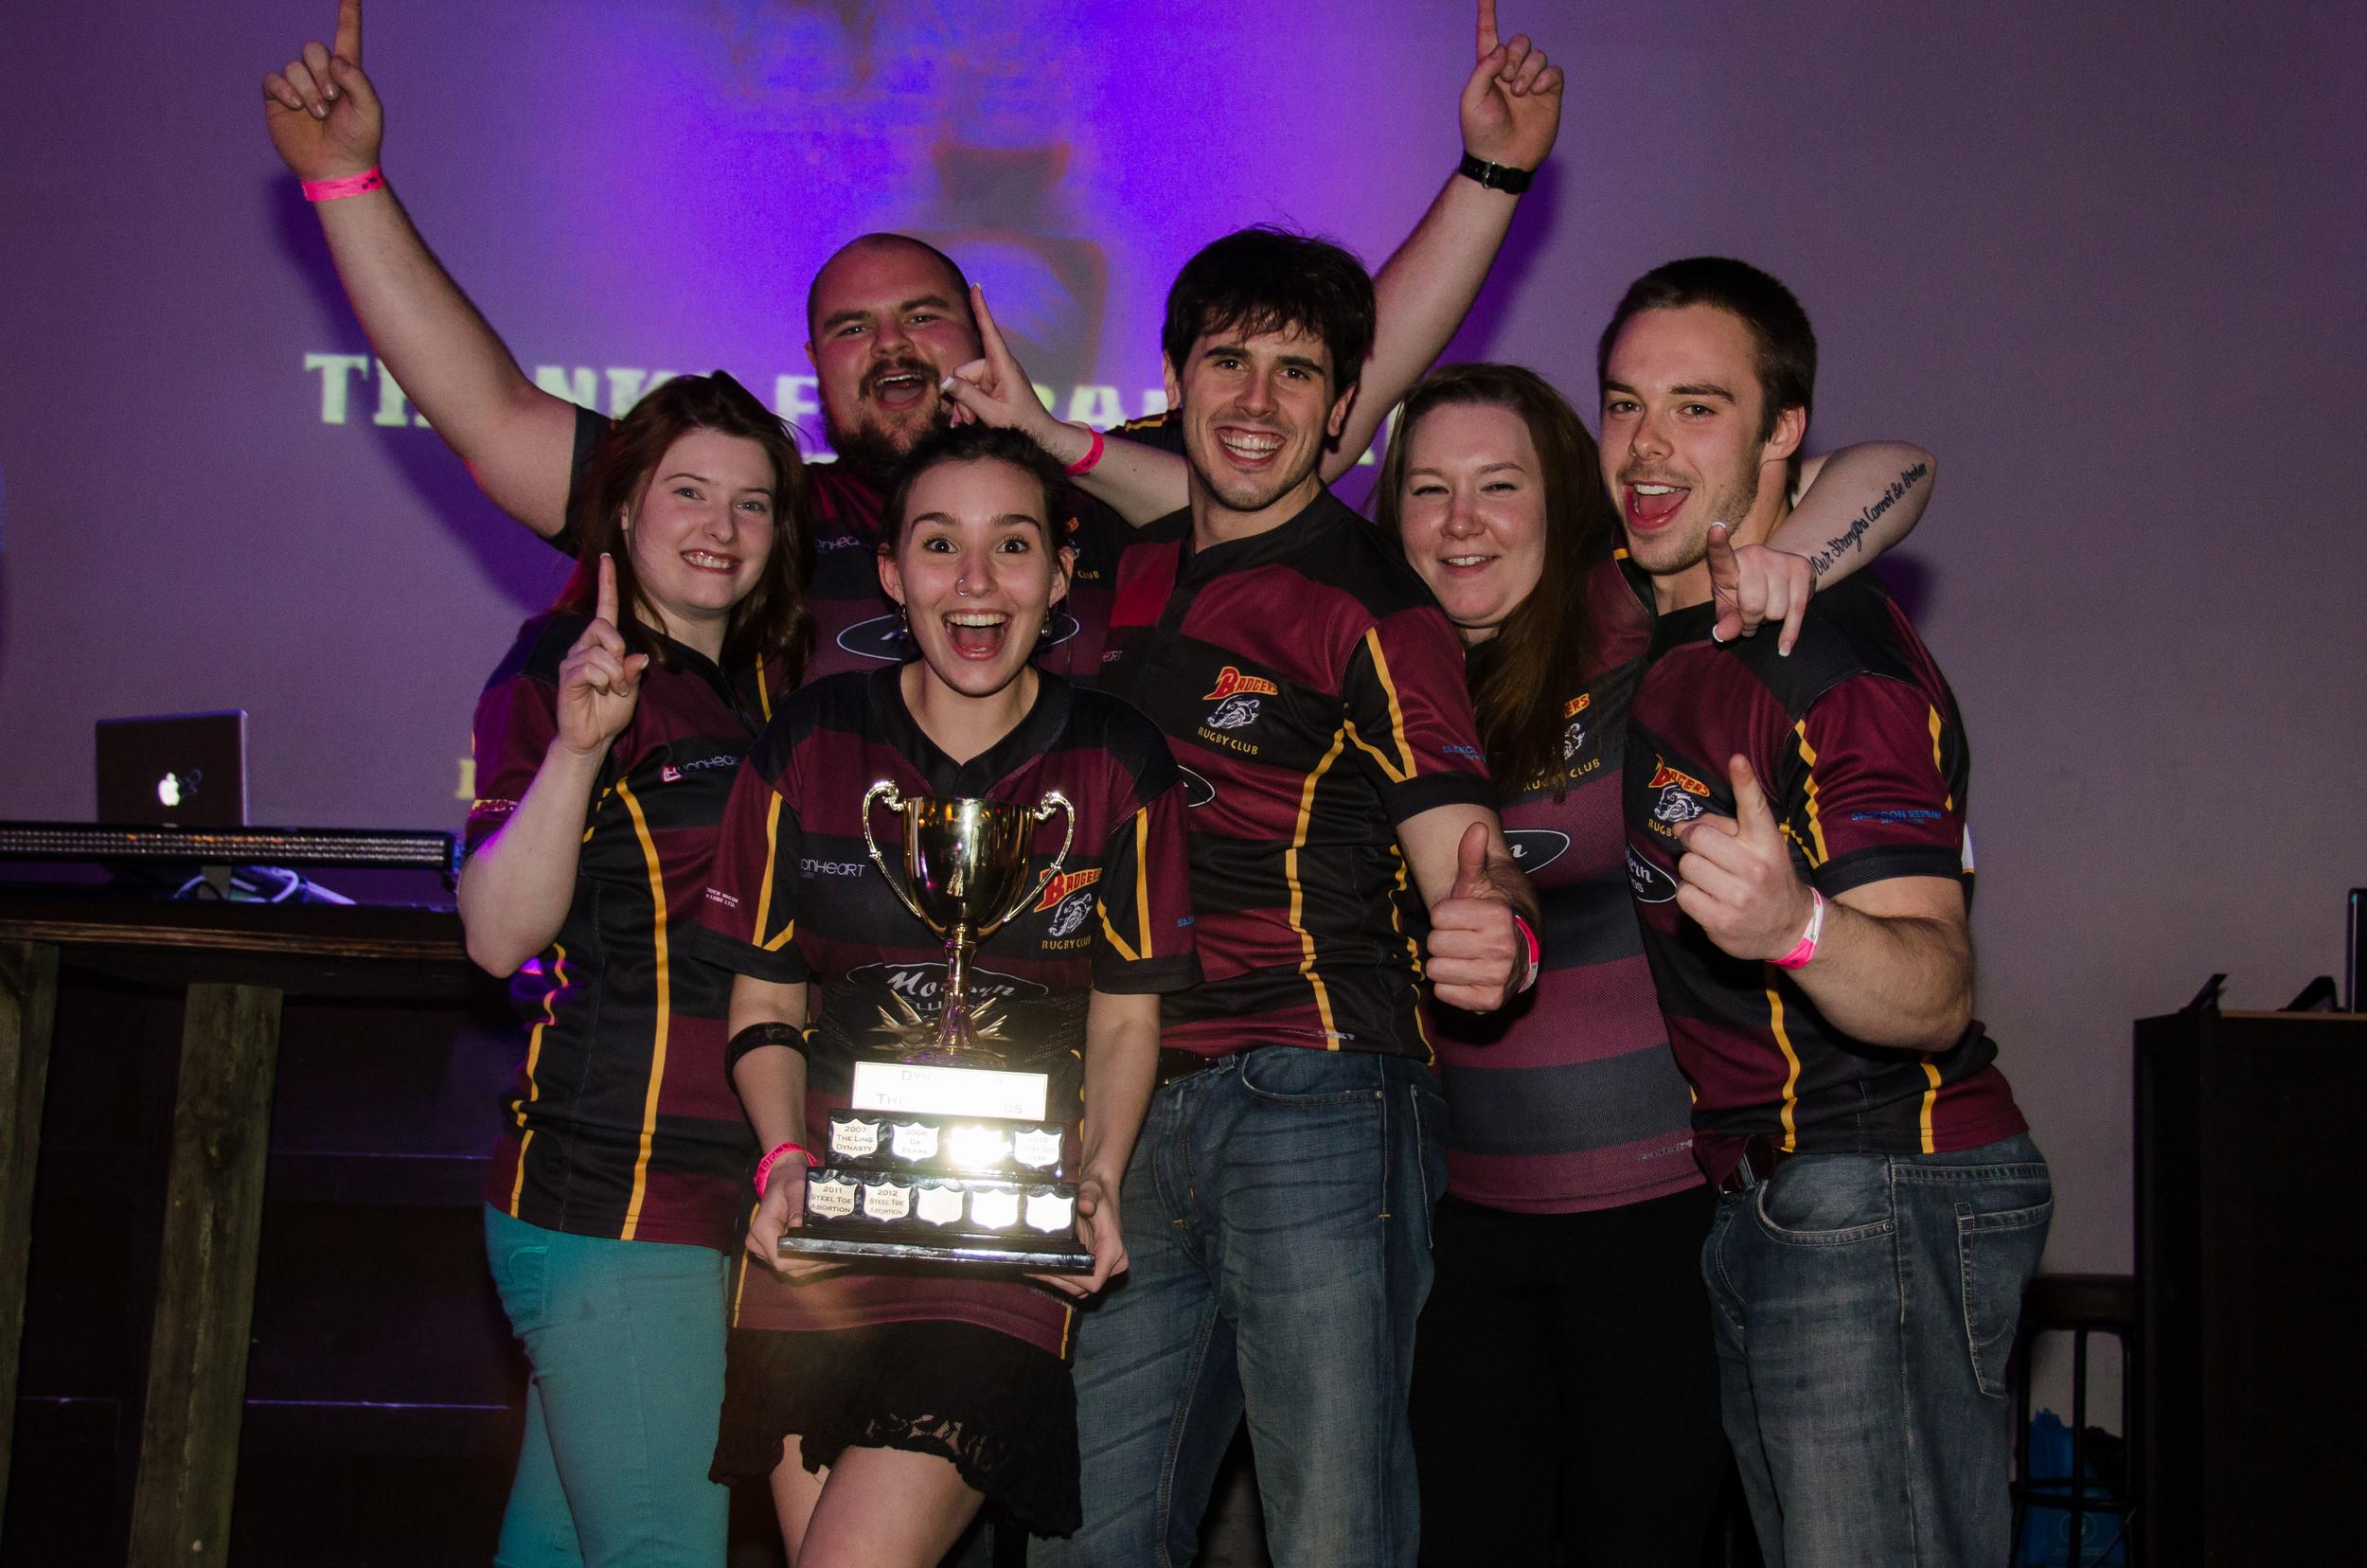 The 2013 ITCF Champions